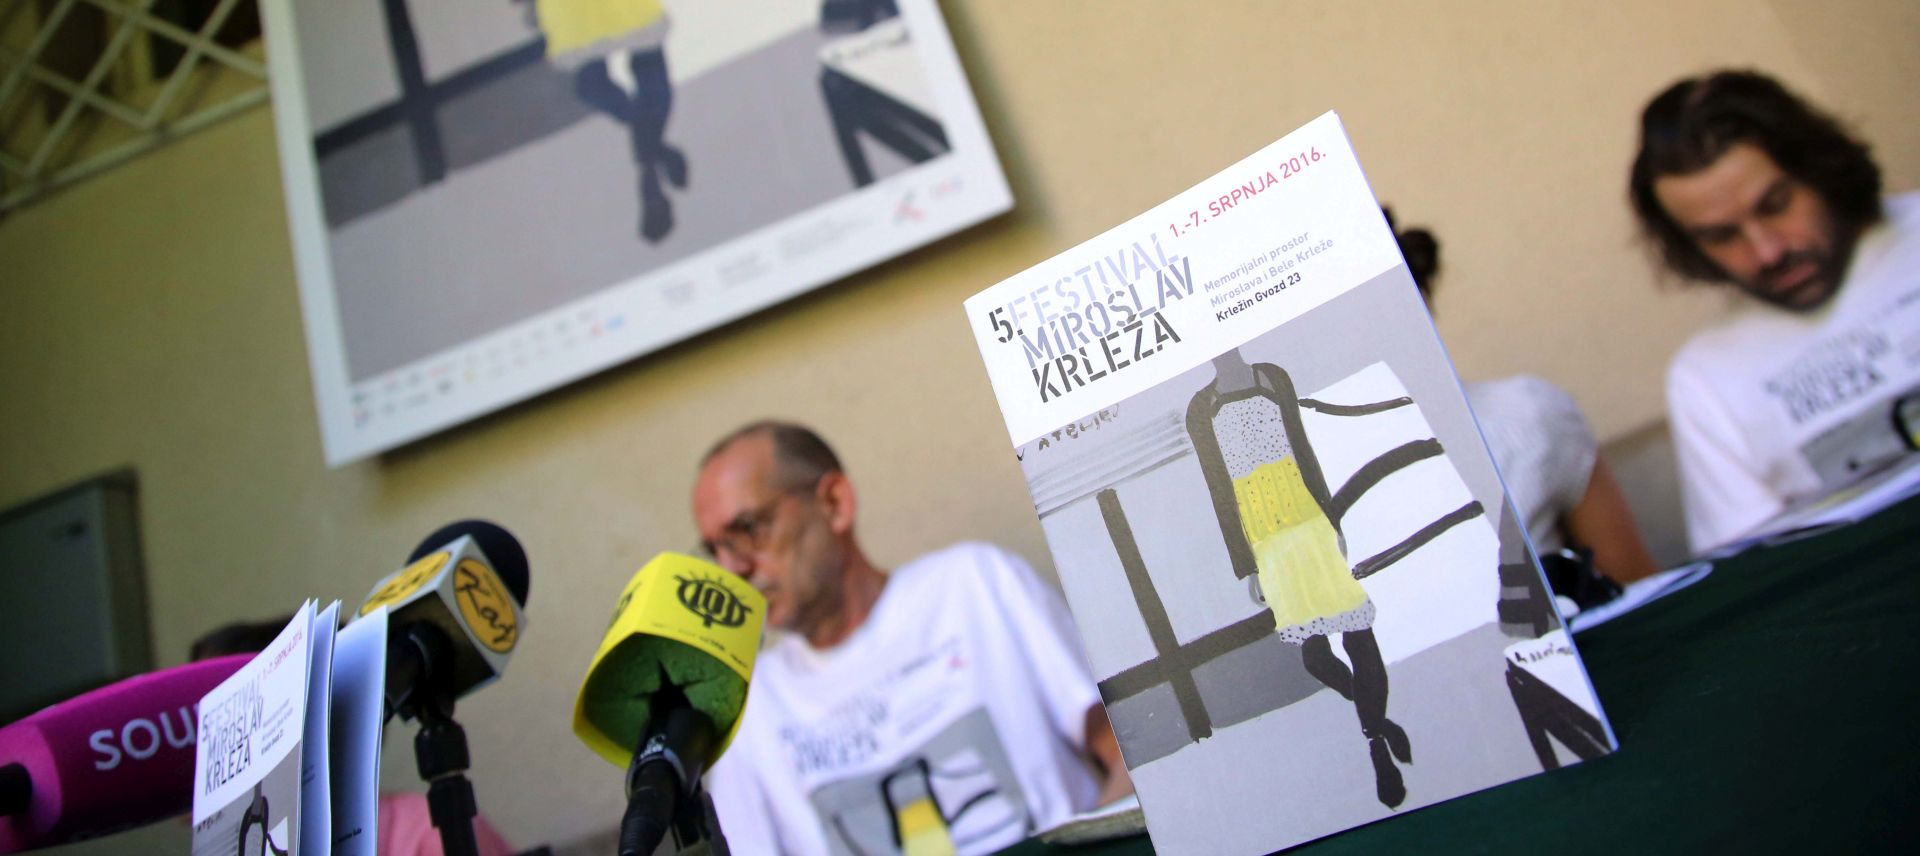 Peti festival Miroslav Krleža održava se od 1. do 7. srpnja